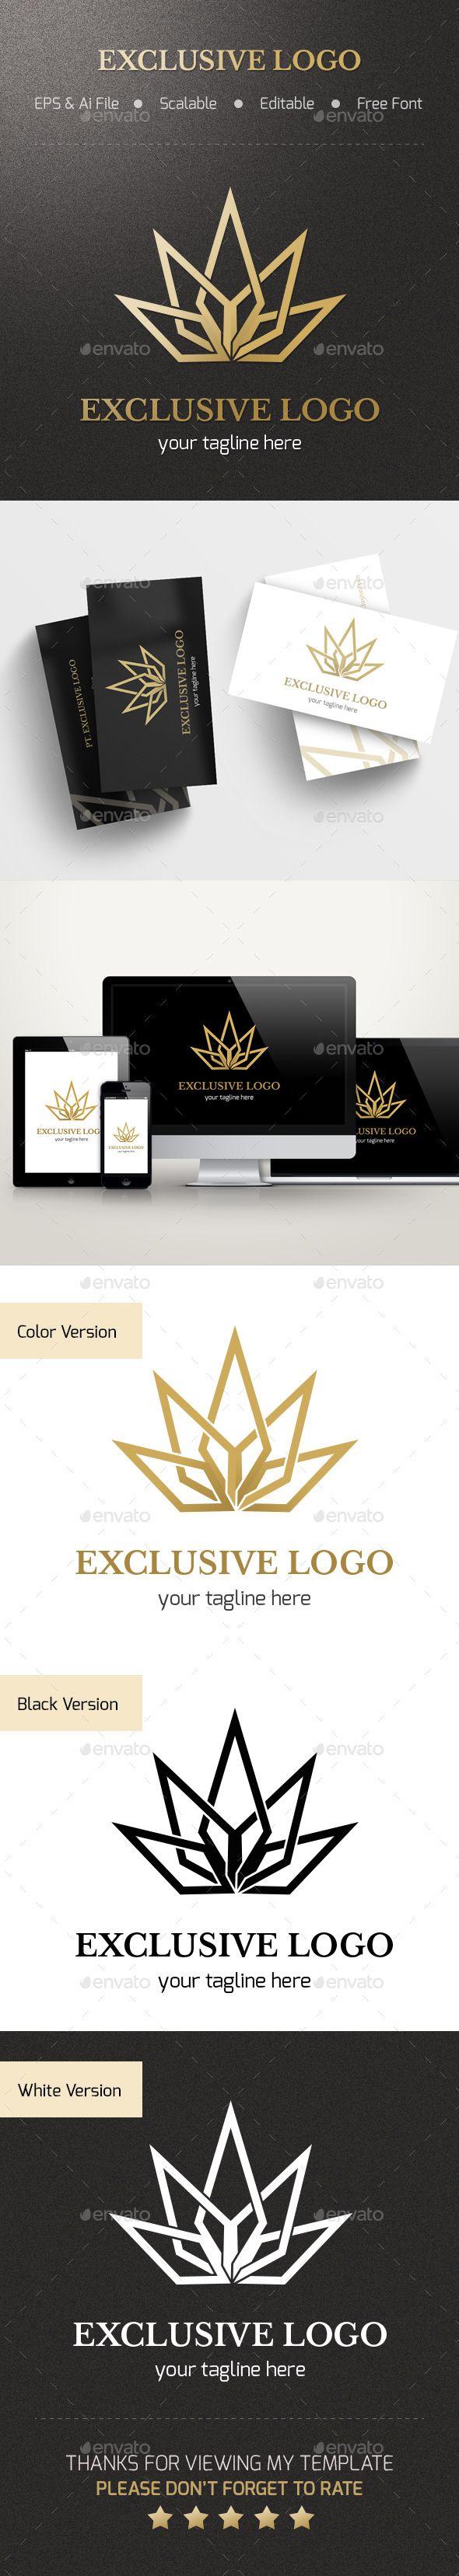 Exclusive  Logo Design Template Vector #logotype Download it here: http://graphicriver.net/item/exclusive-logo/14123922?s_rank=247?ref=nexion